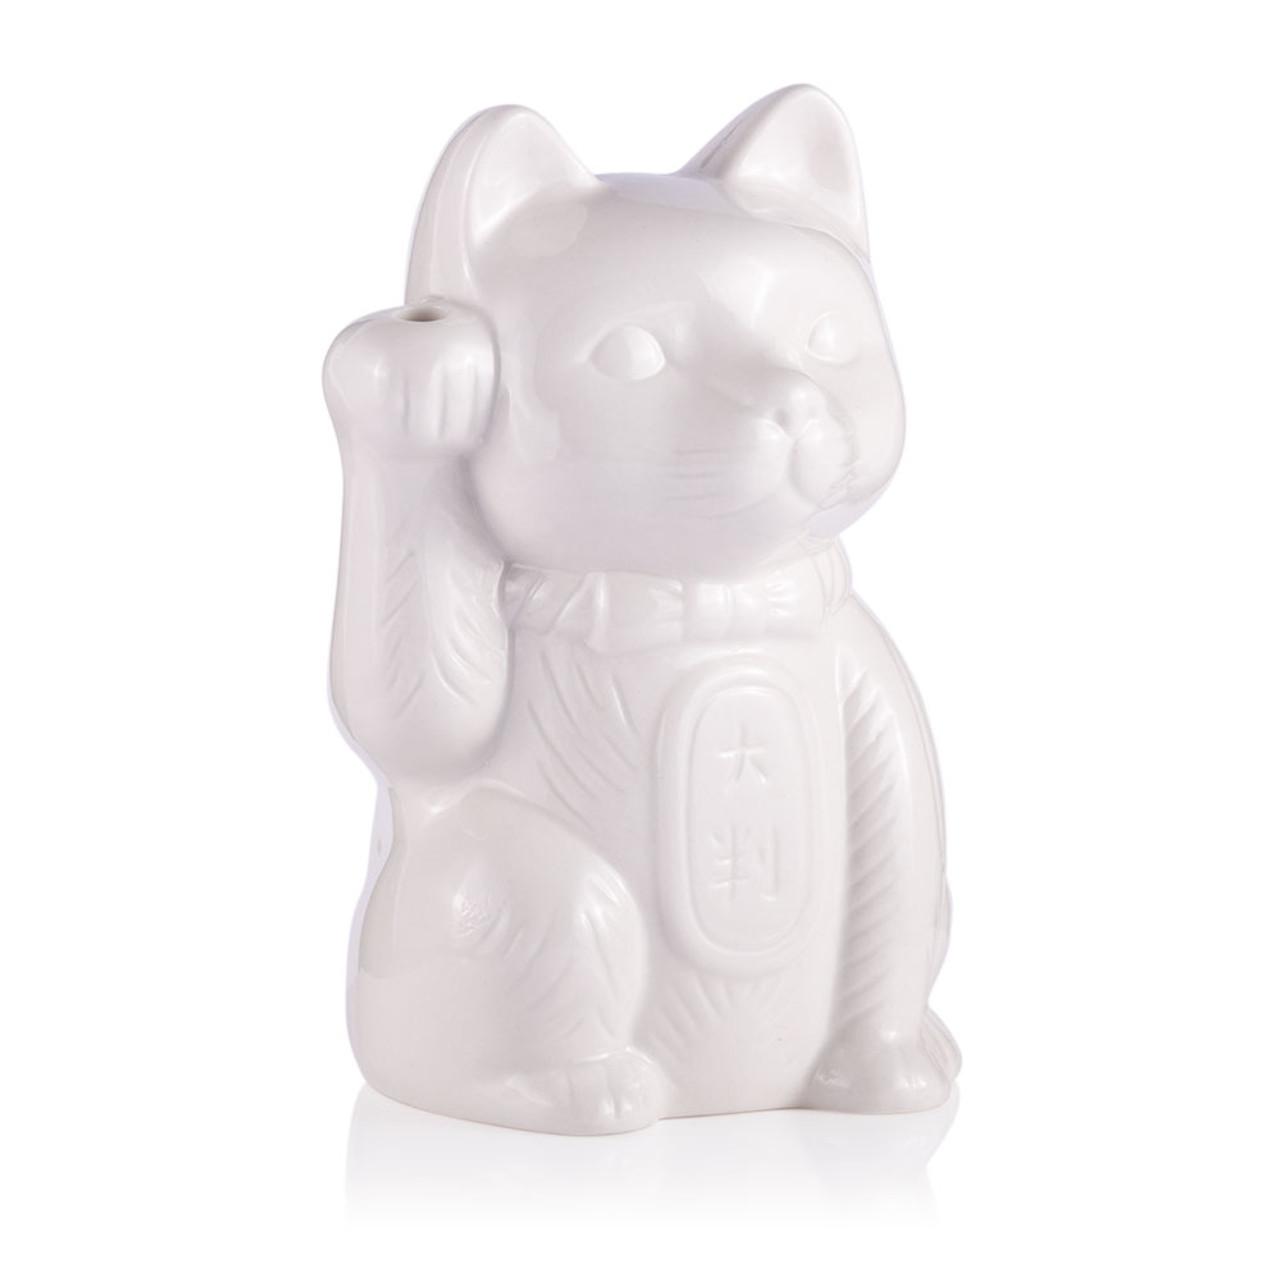 Maneki Neko Lucky Cat Ceramic Tiki Mug 14 Oz